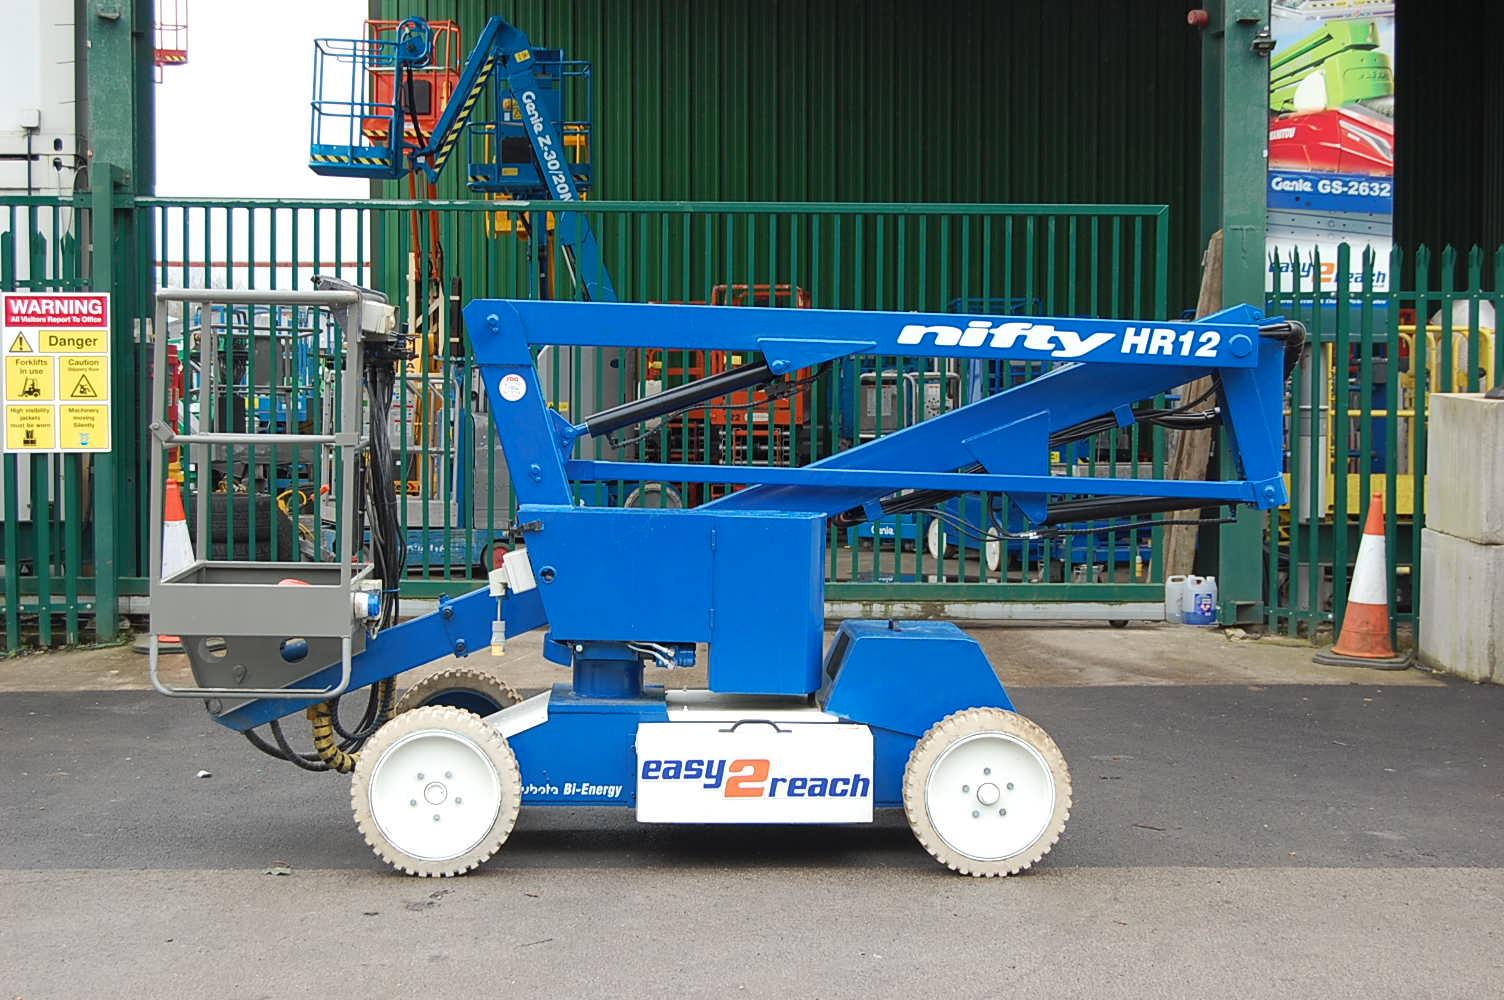 Niftylift HR12 NDE Boom Lift